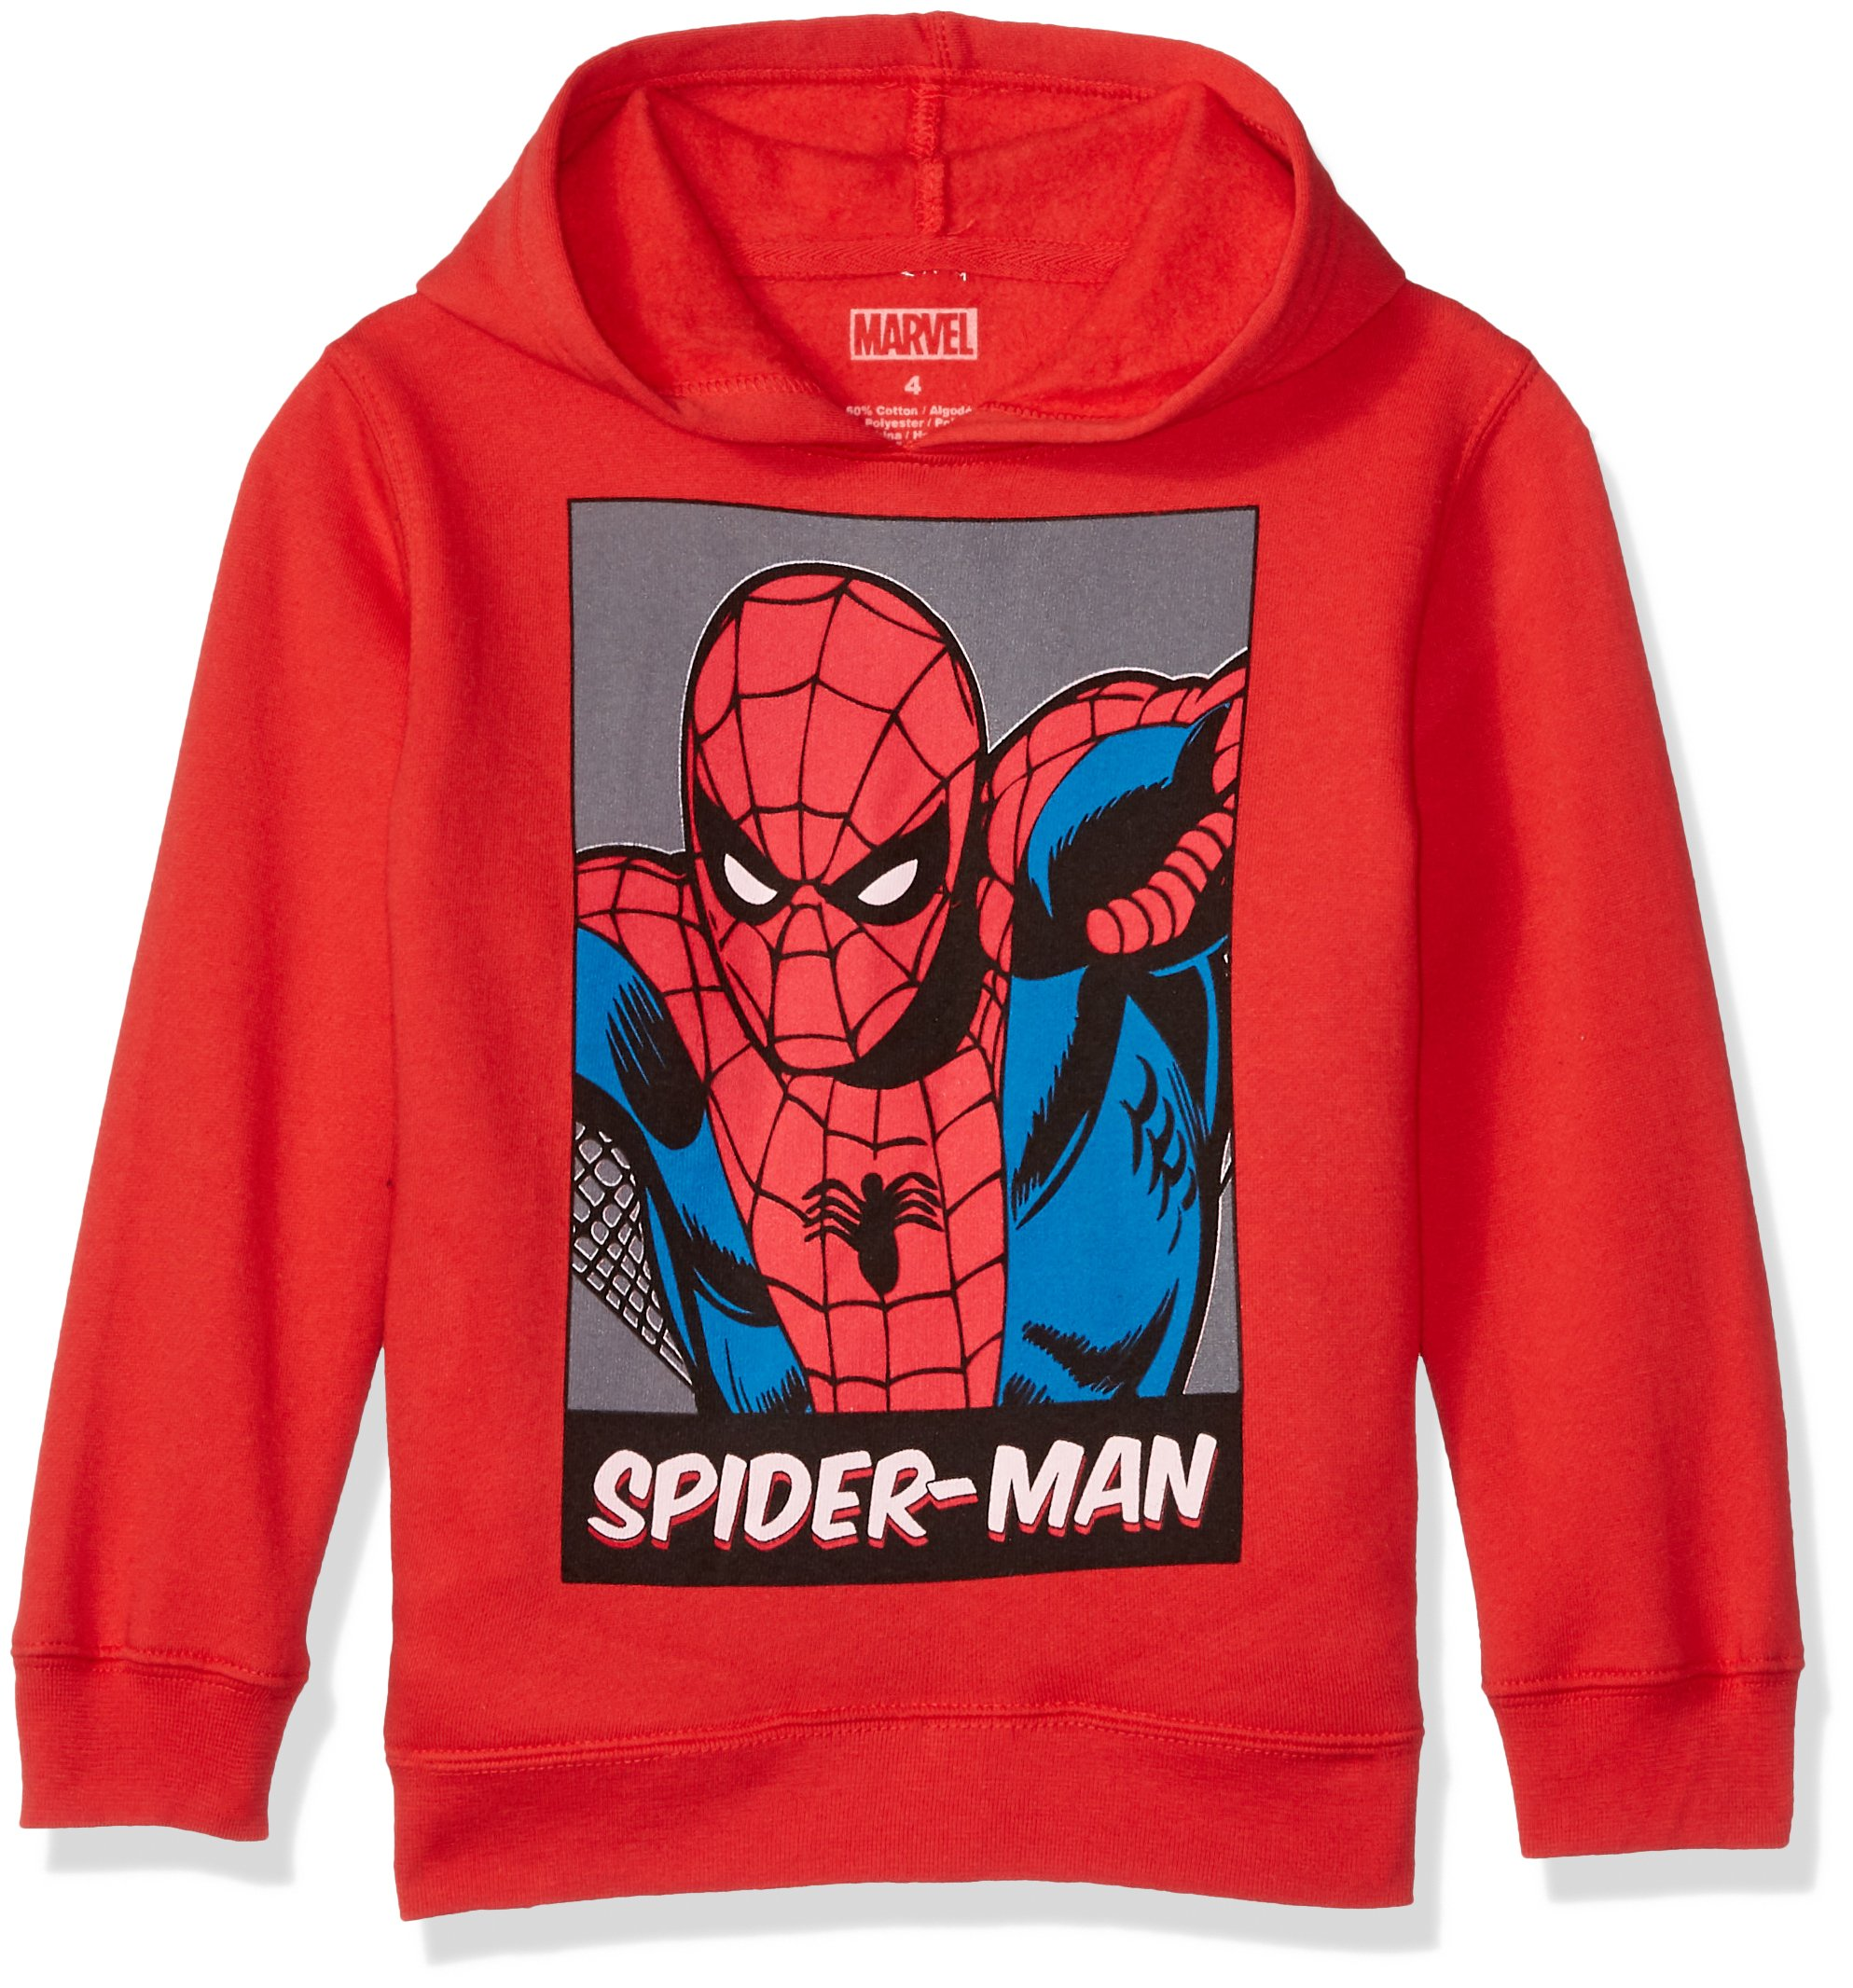 Marvel Boys' Little Spider-Man Pullover Sweatshirt red, 7